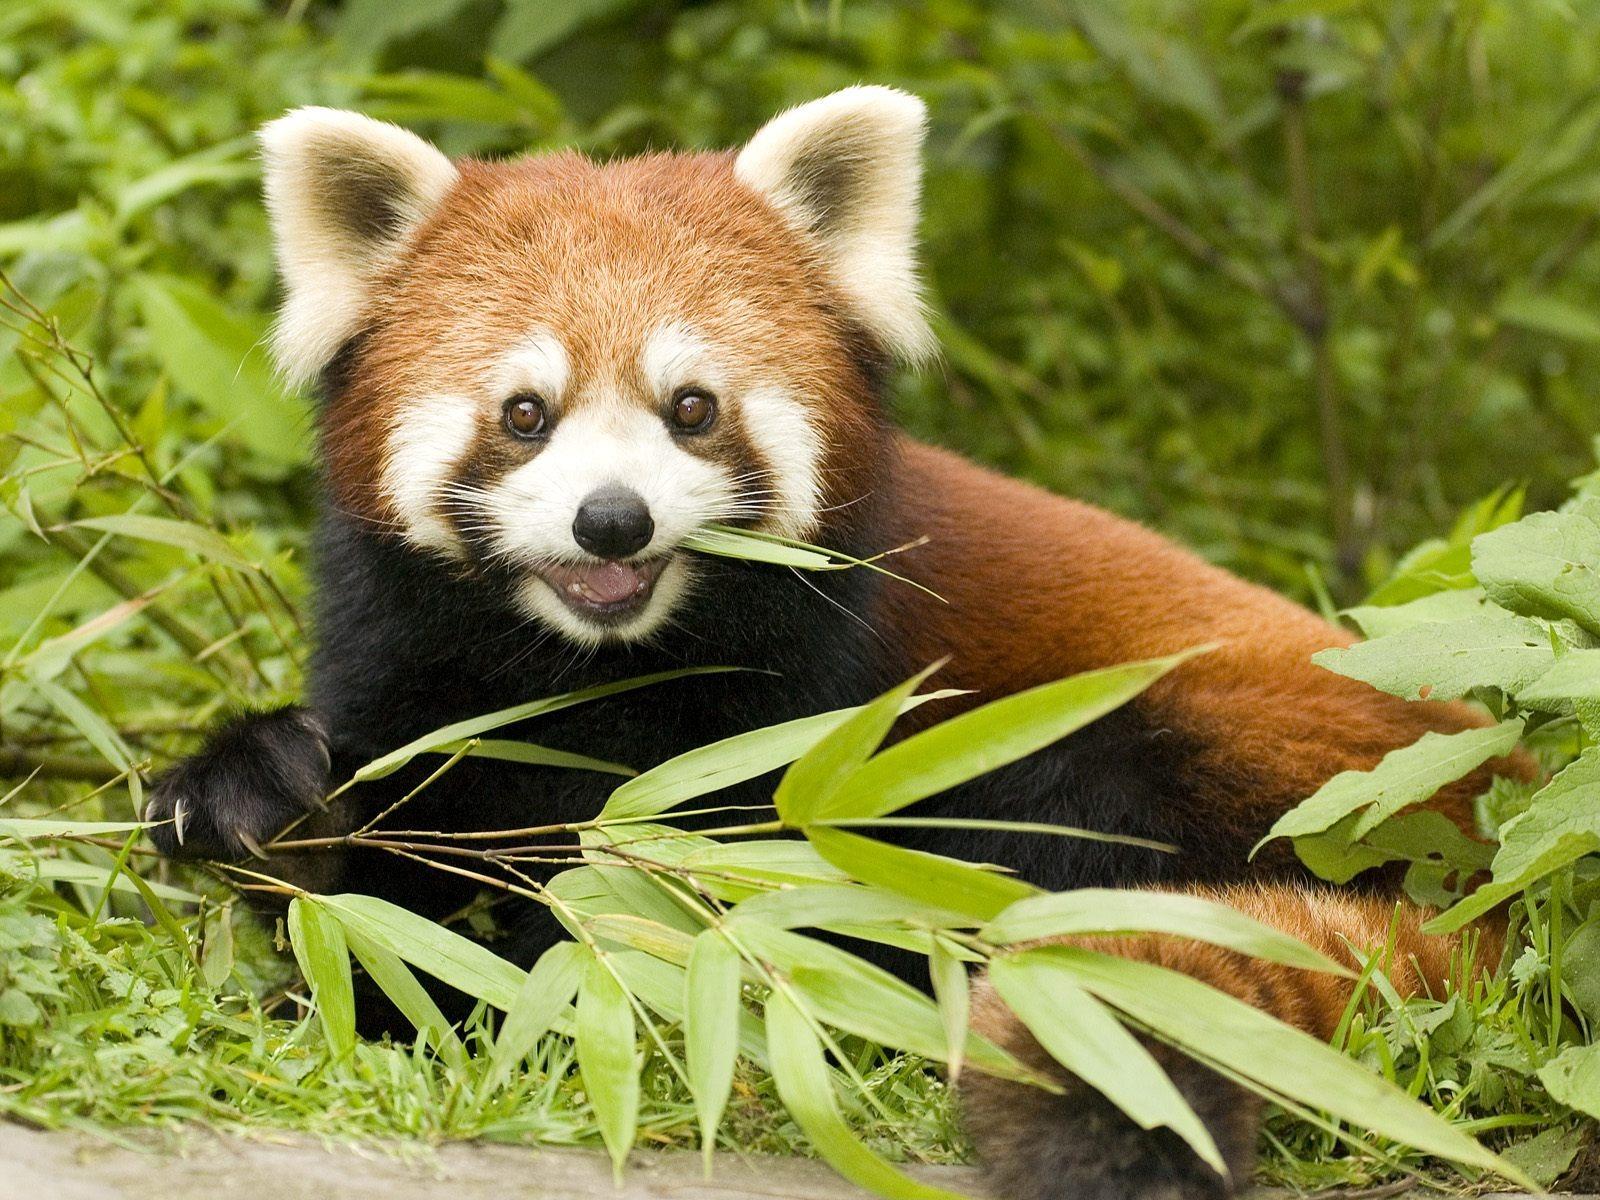 http://3.bp.blogspot.com/-8z51ezuc1xU/Tq0FvjzJnTI/AAAAAAAABdE/KwBpfNXS030/s1600/red_panda_eating_bamboo_wallpaper_bears_animals_wallpaper_1600_1200.jpg